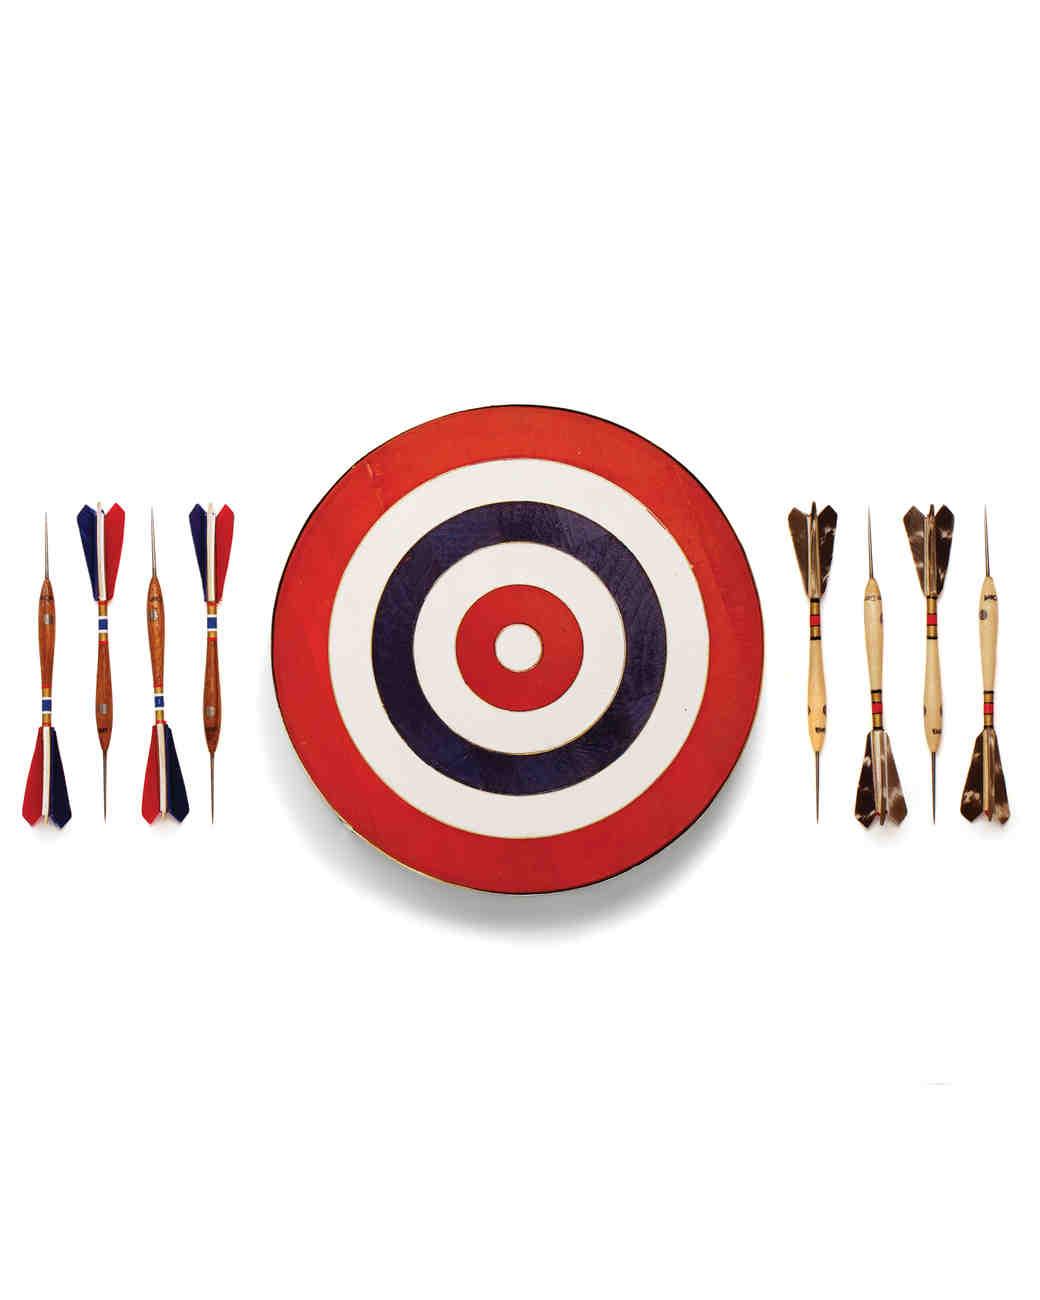 fathers-gift-guide-decor-darts-0515.jpg